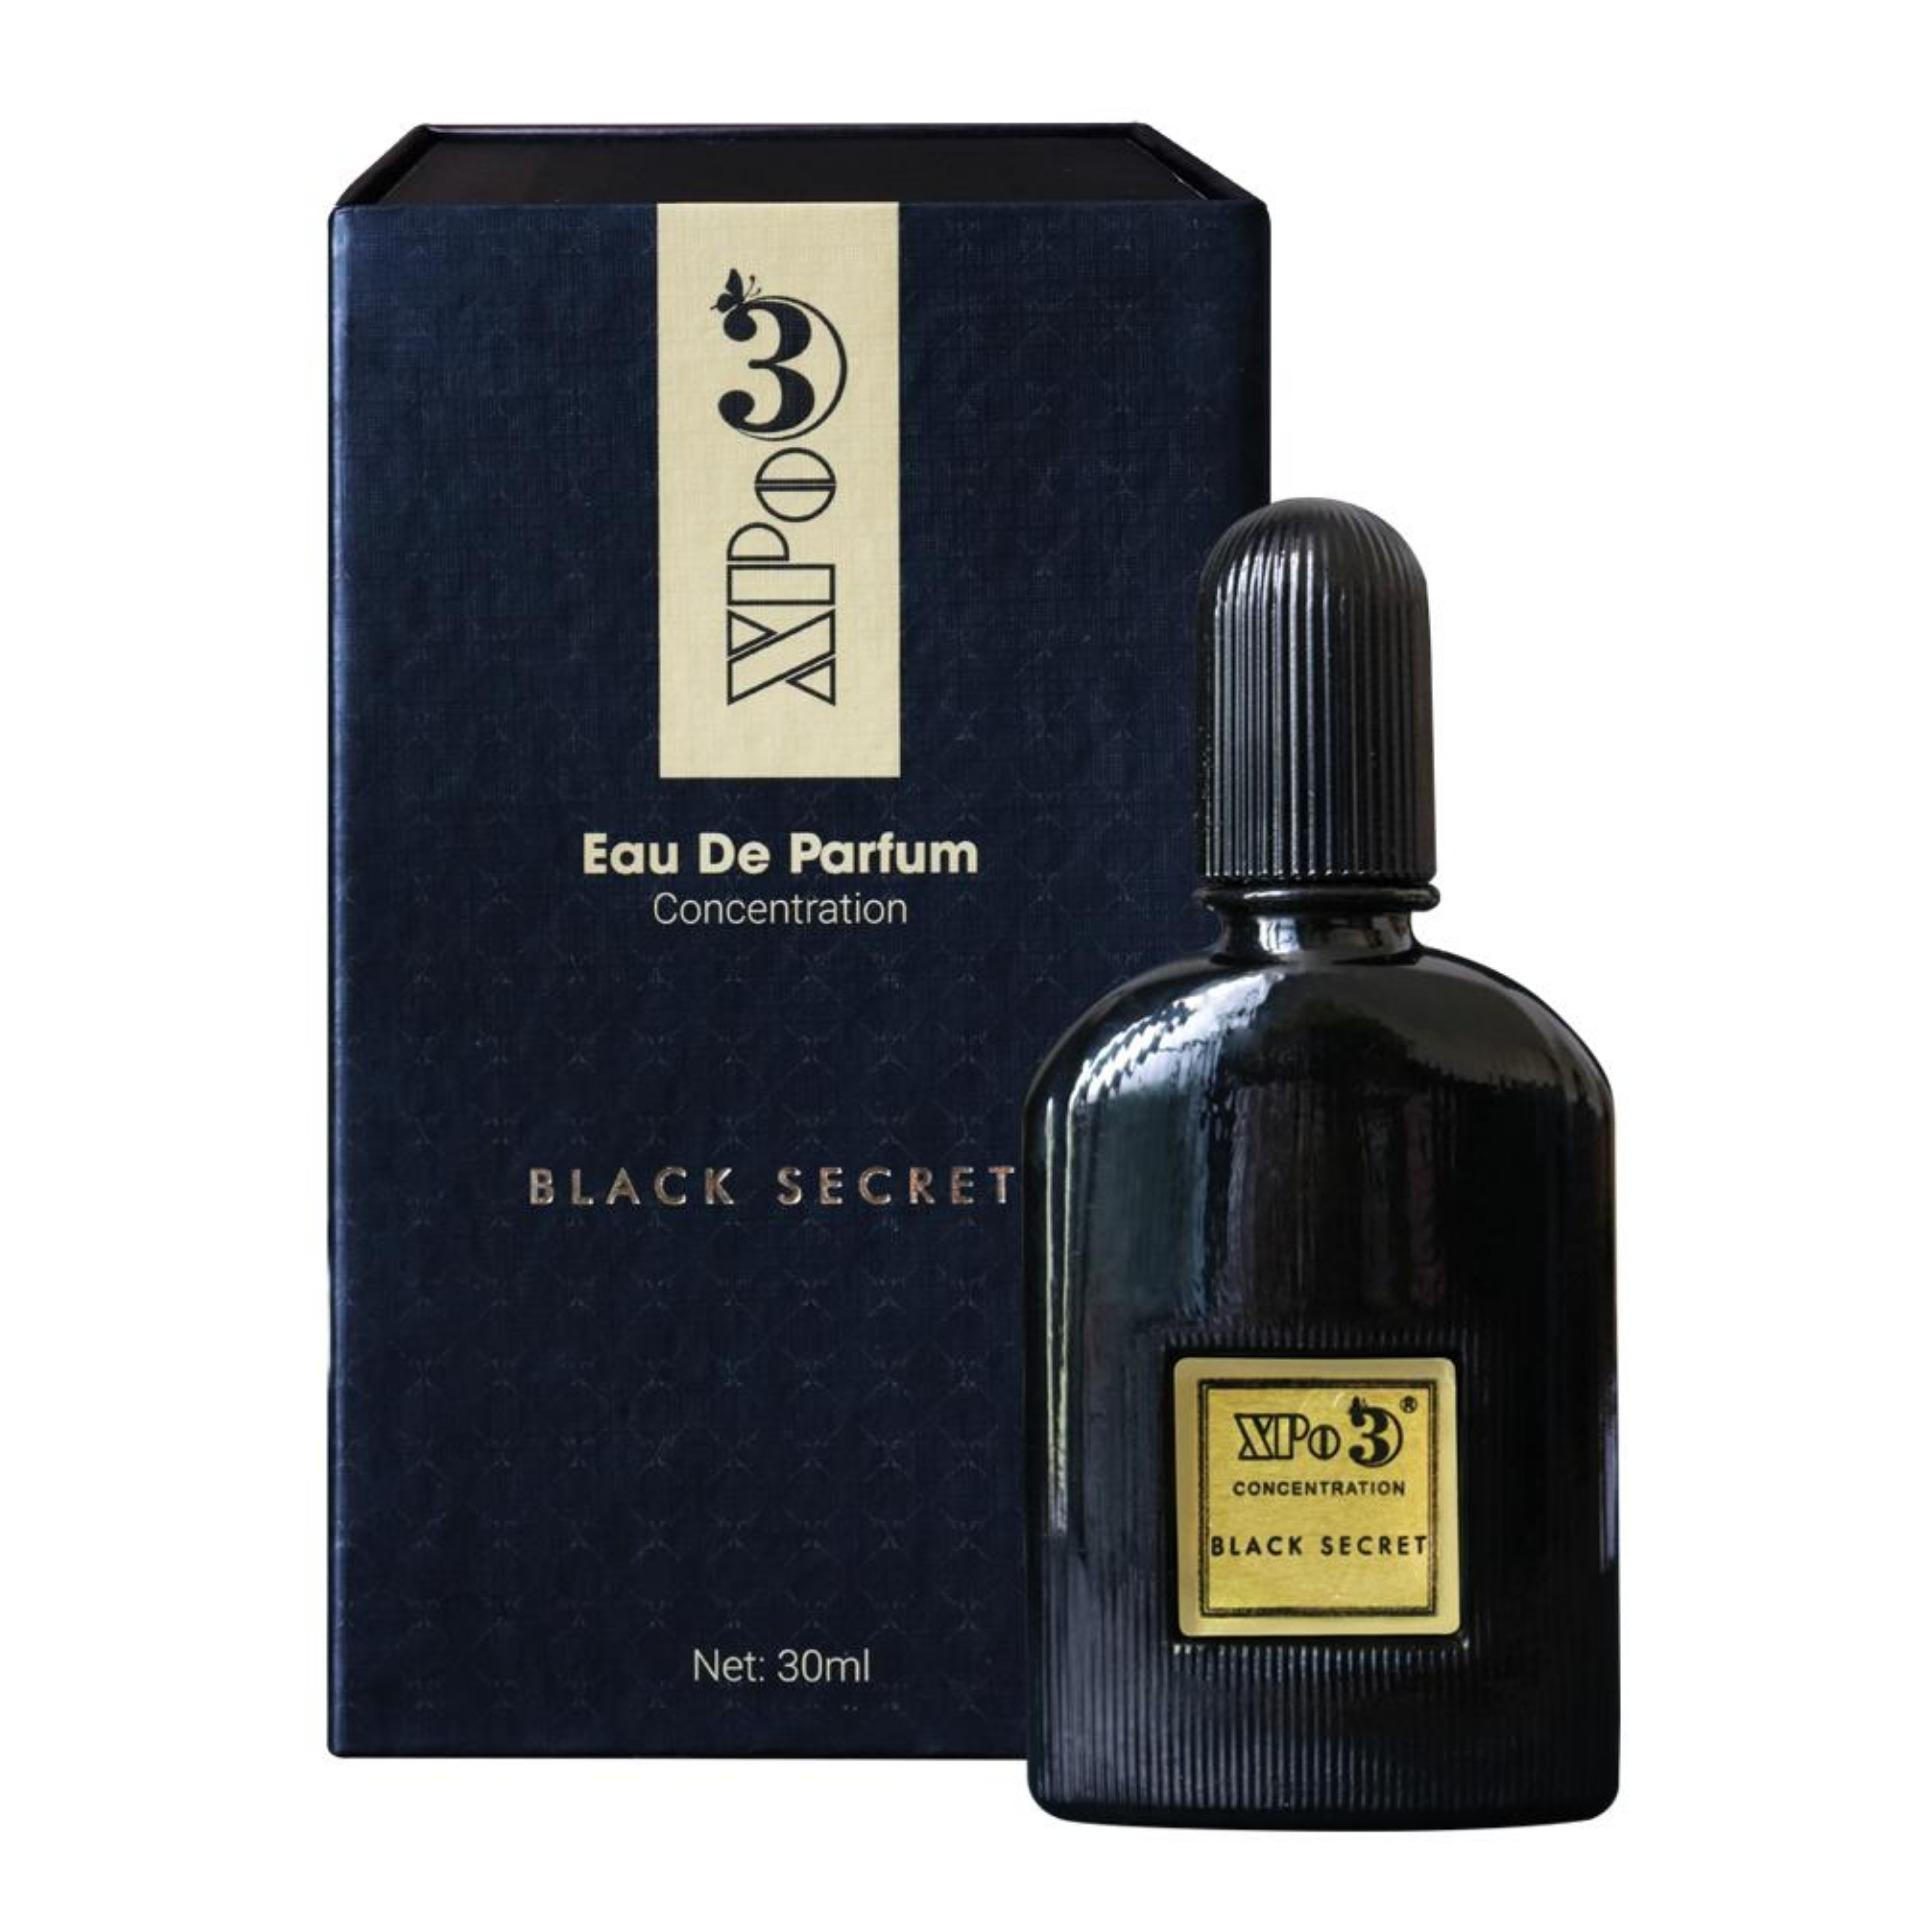 Nước hoa XBeauty XPo3 Black Secret 30ml cao cấp